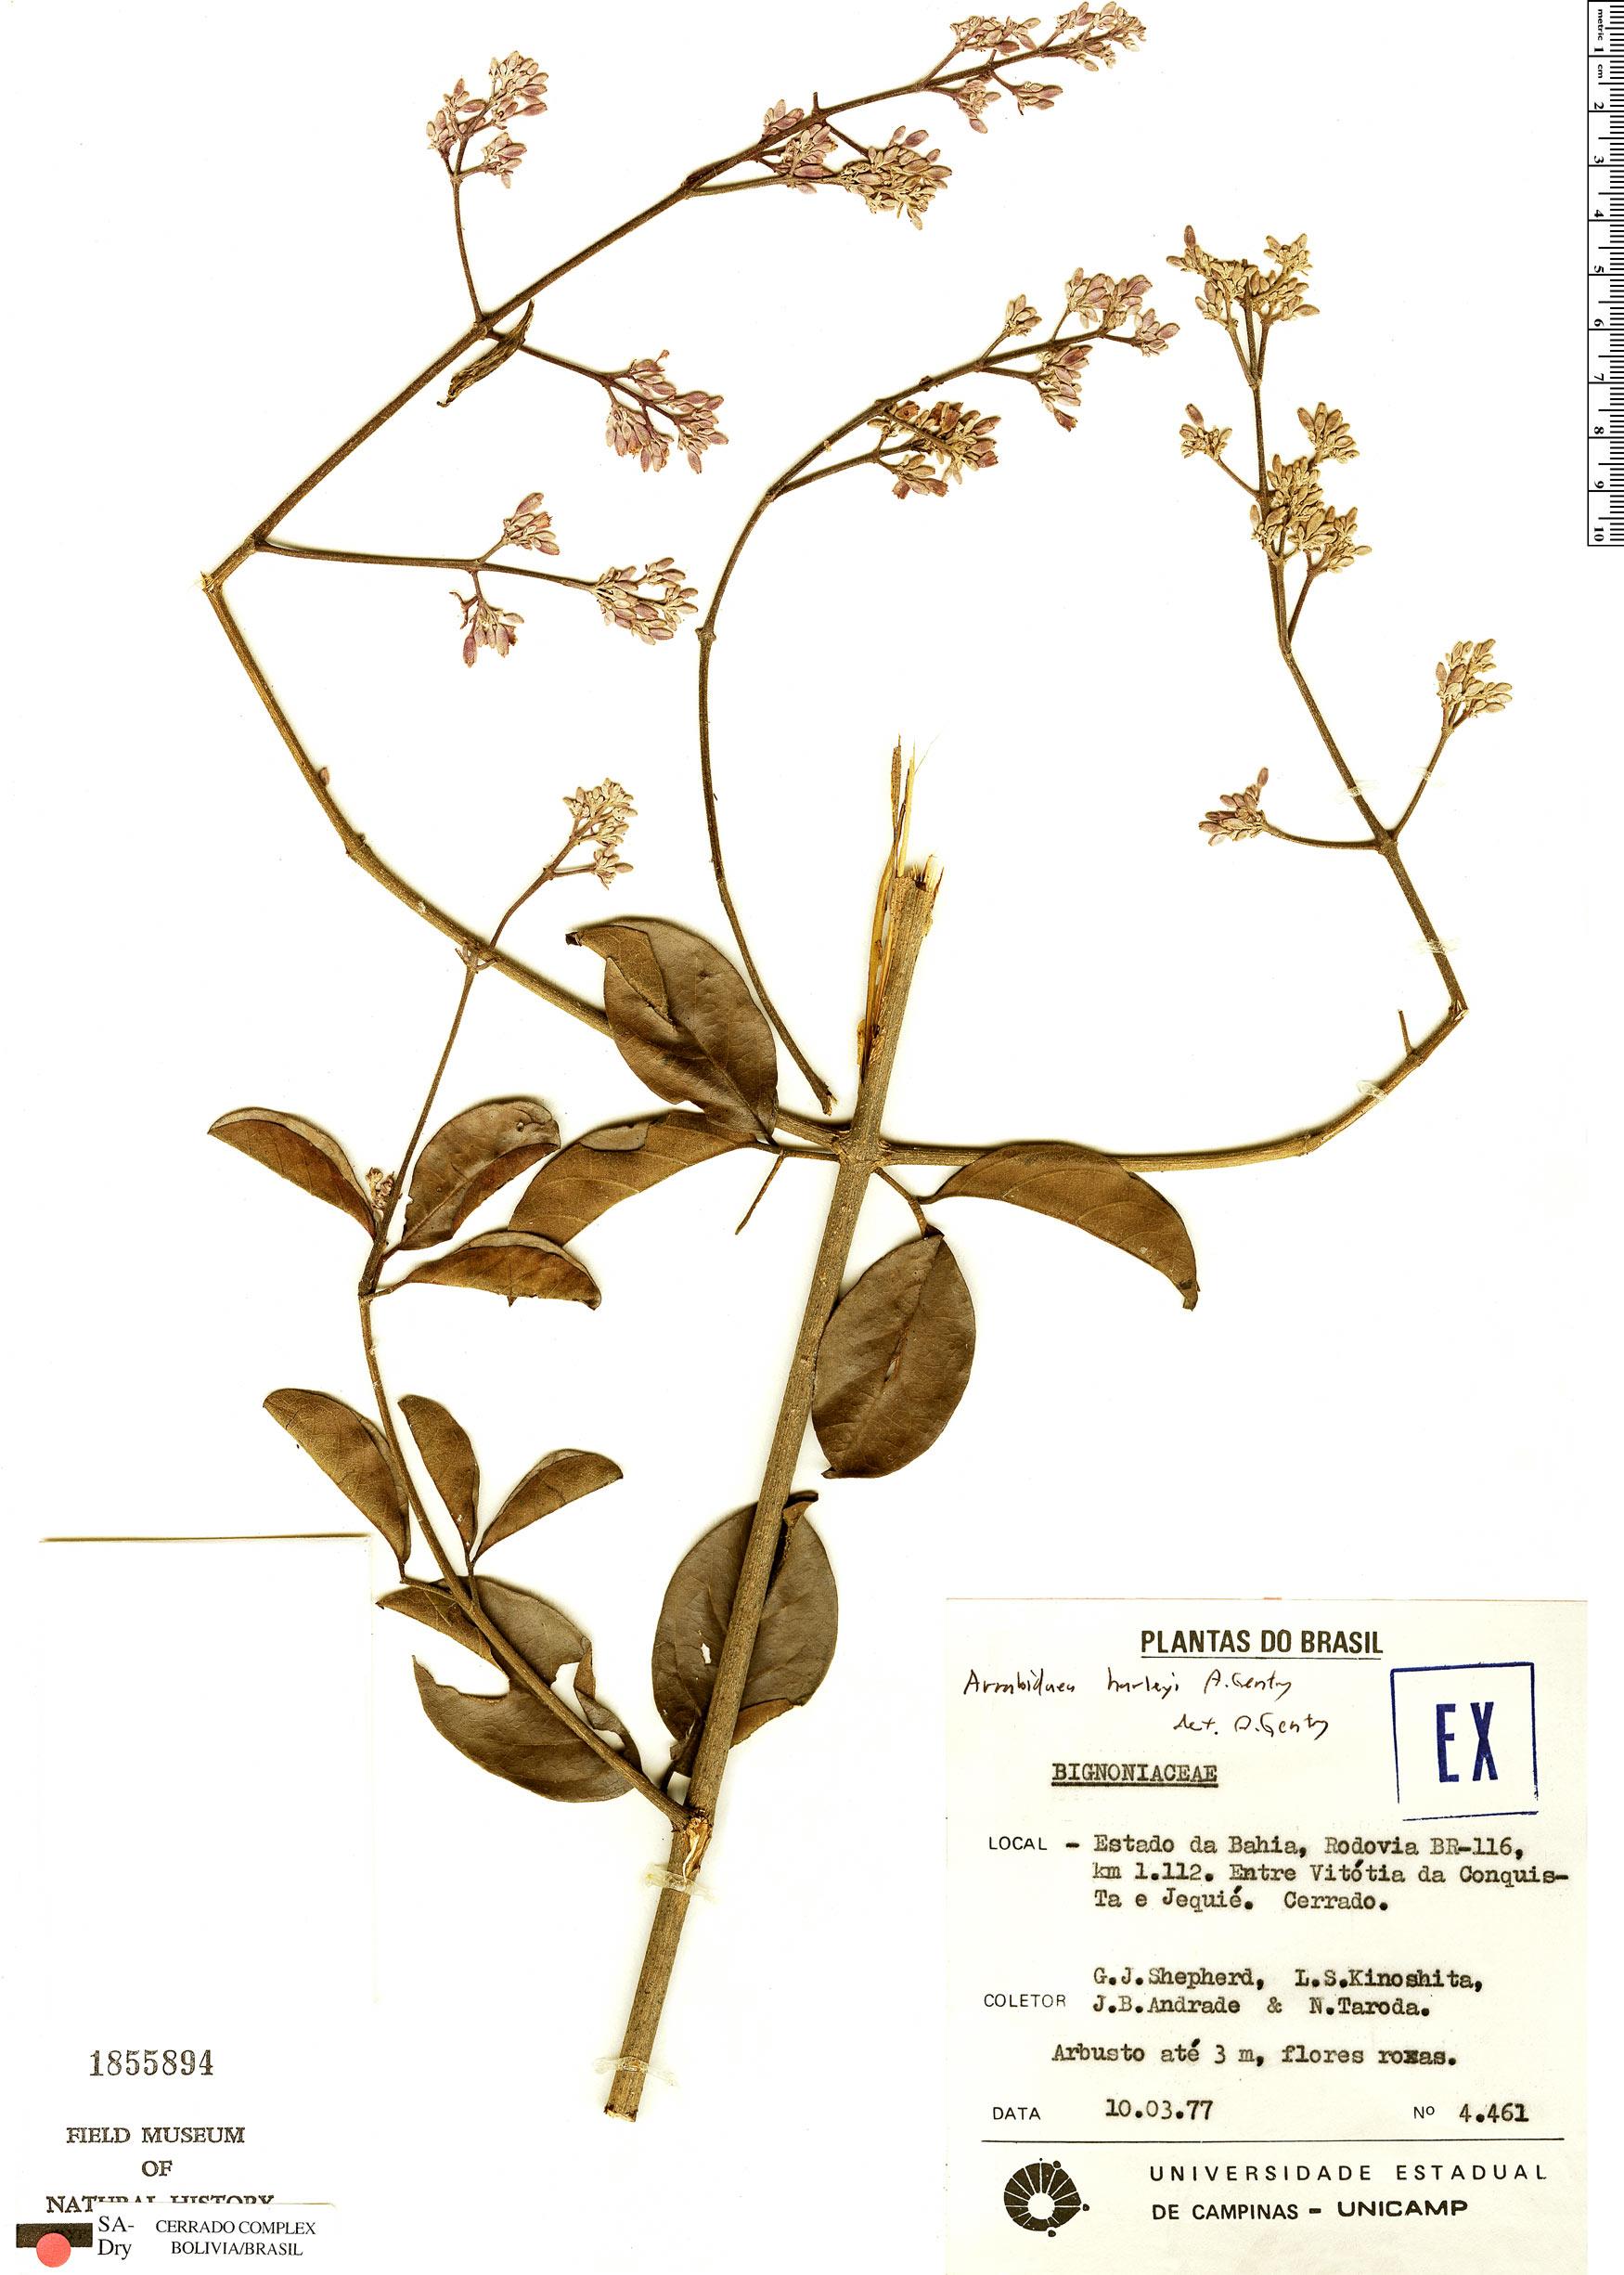 Specimen: Xylophragma harleyi